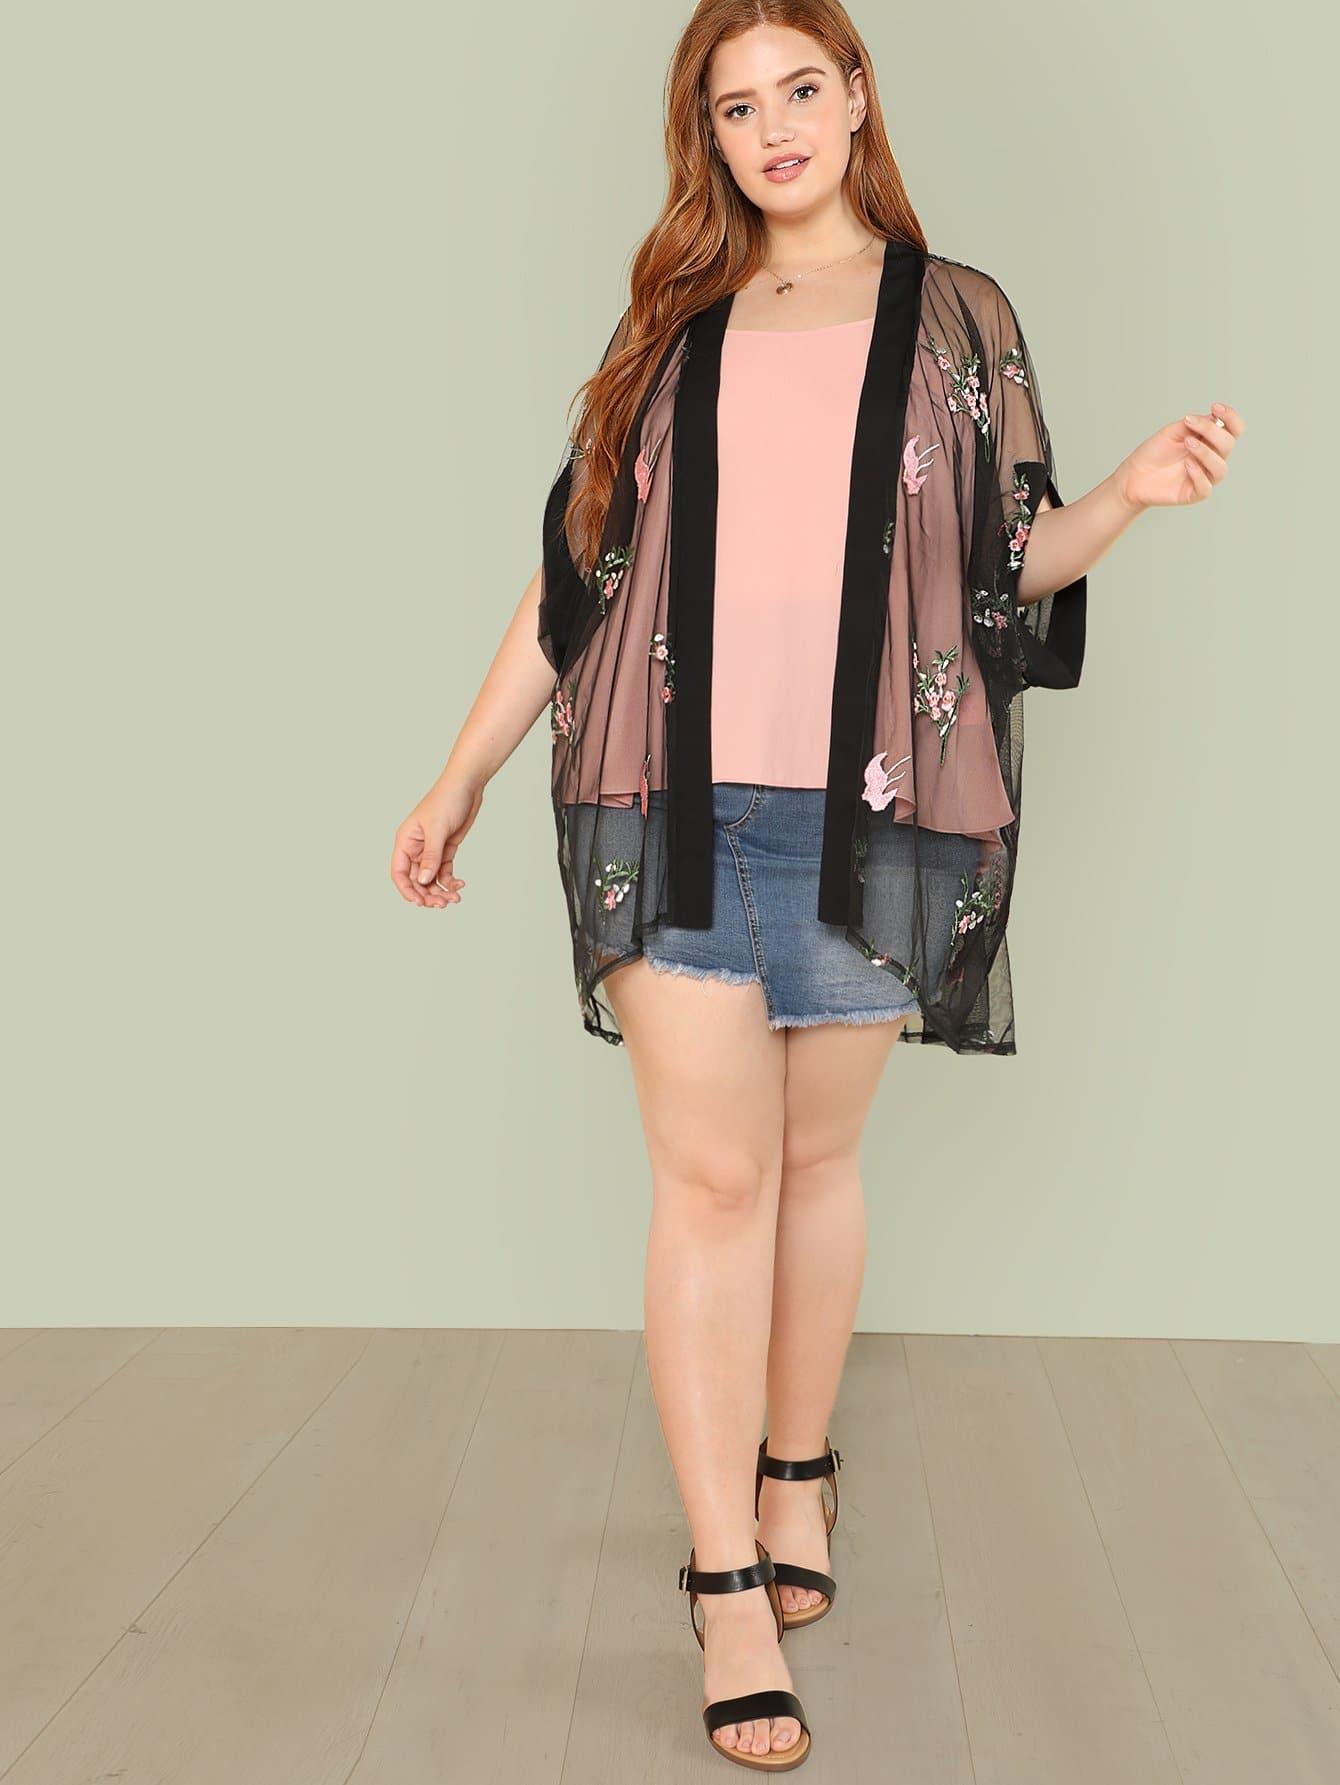 Купить Прозрачное кимоно с вышивкой, Bree Kish, SheIn